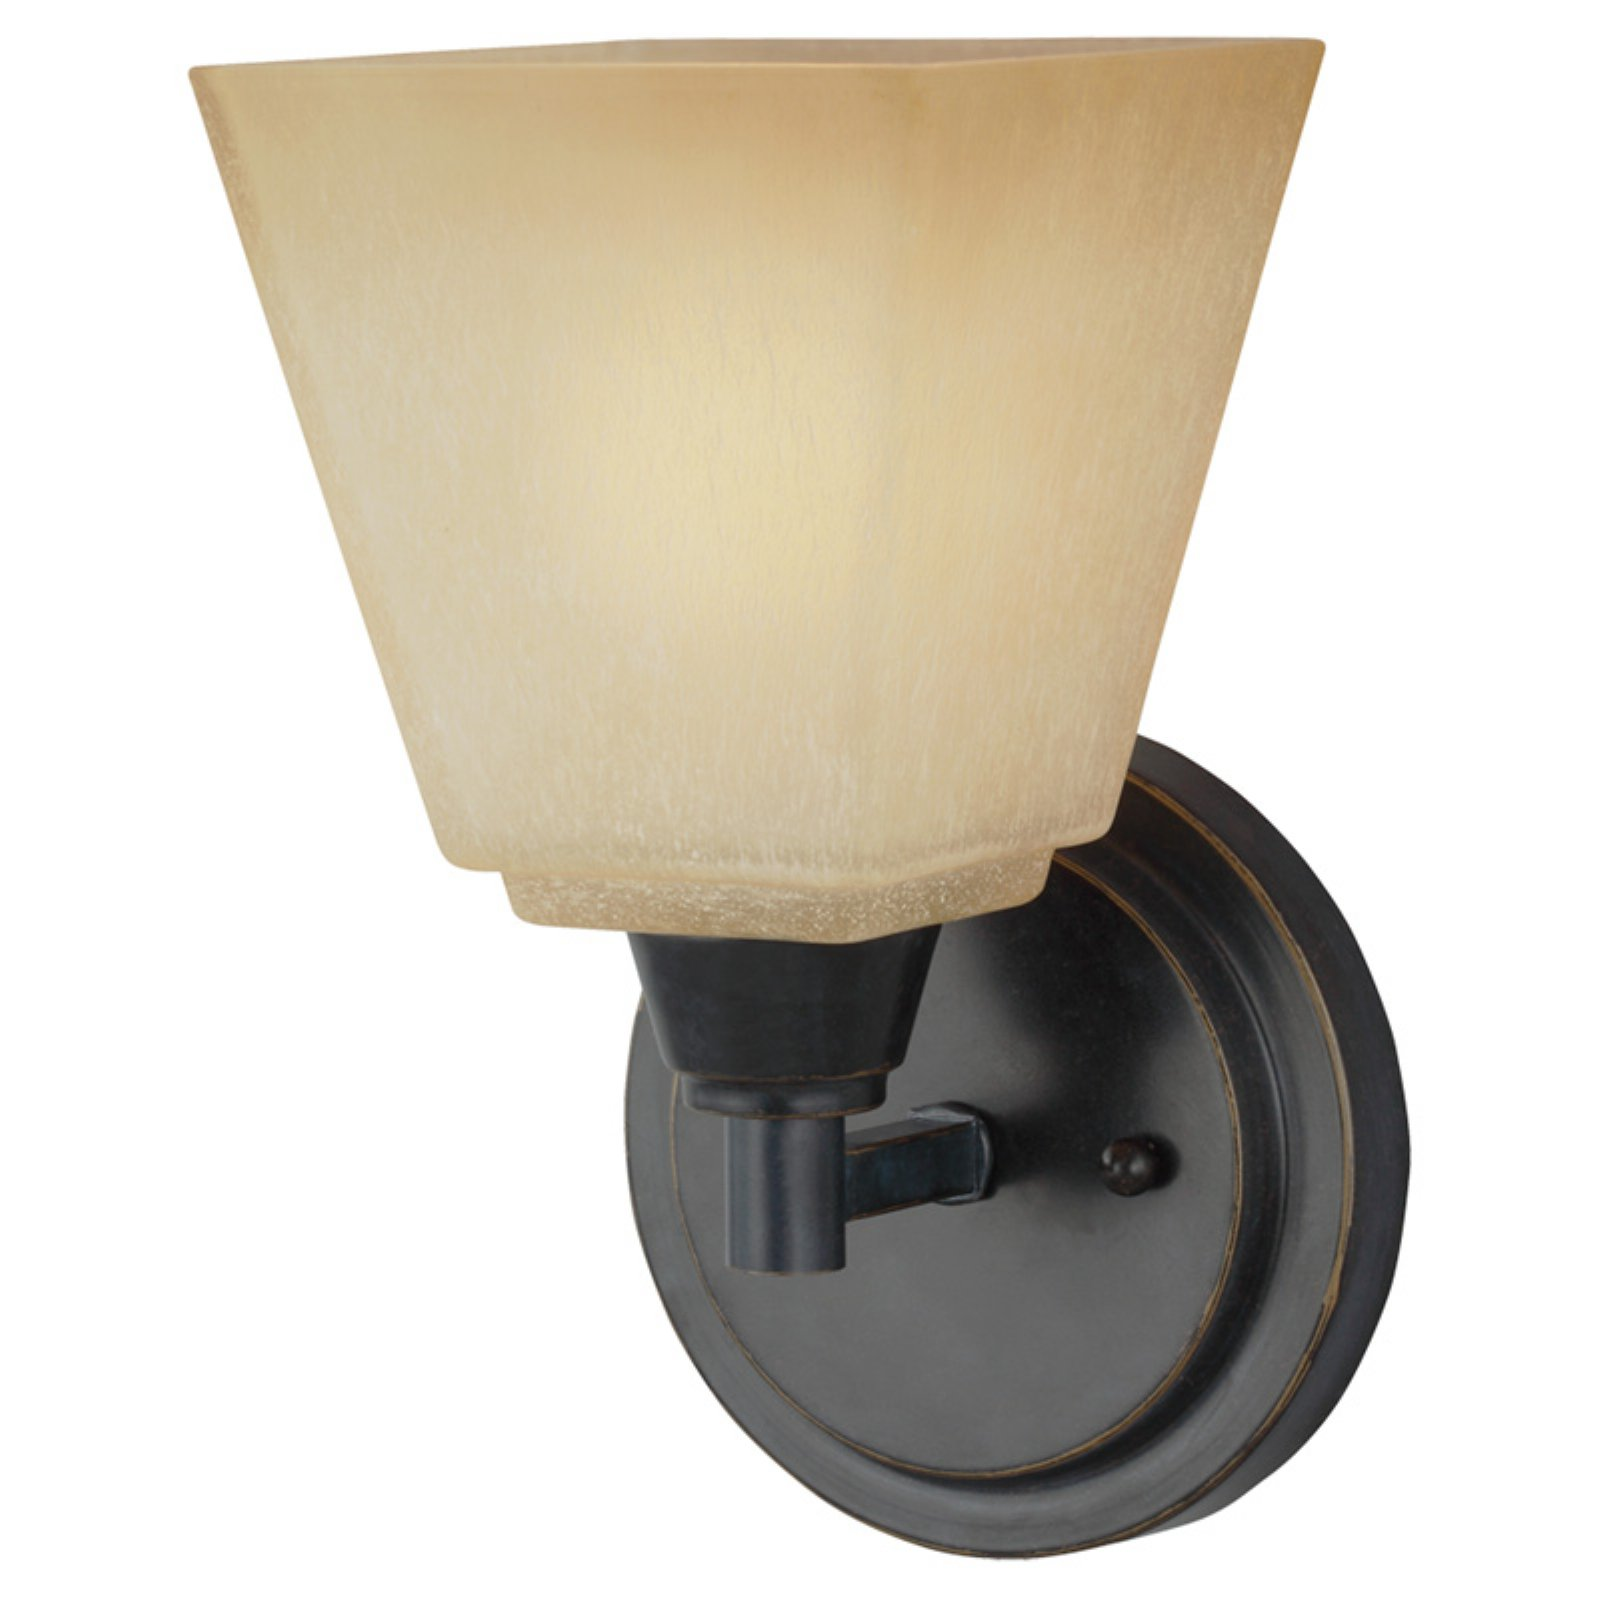 Sea Gull Lighting Parkfield 4113001 1-Light Wall / Bath Sconce